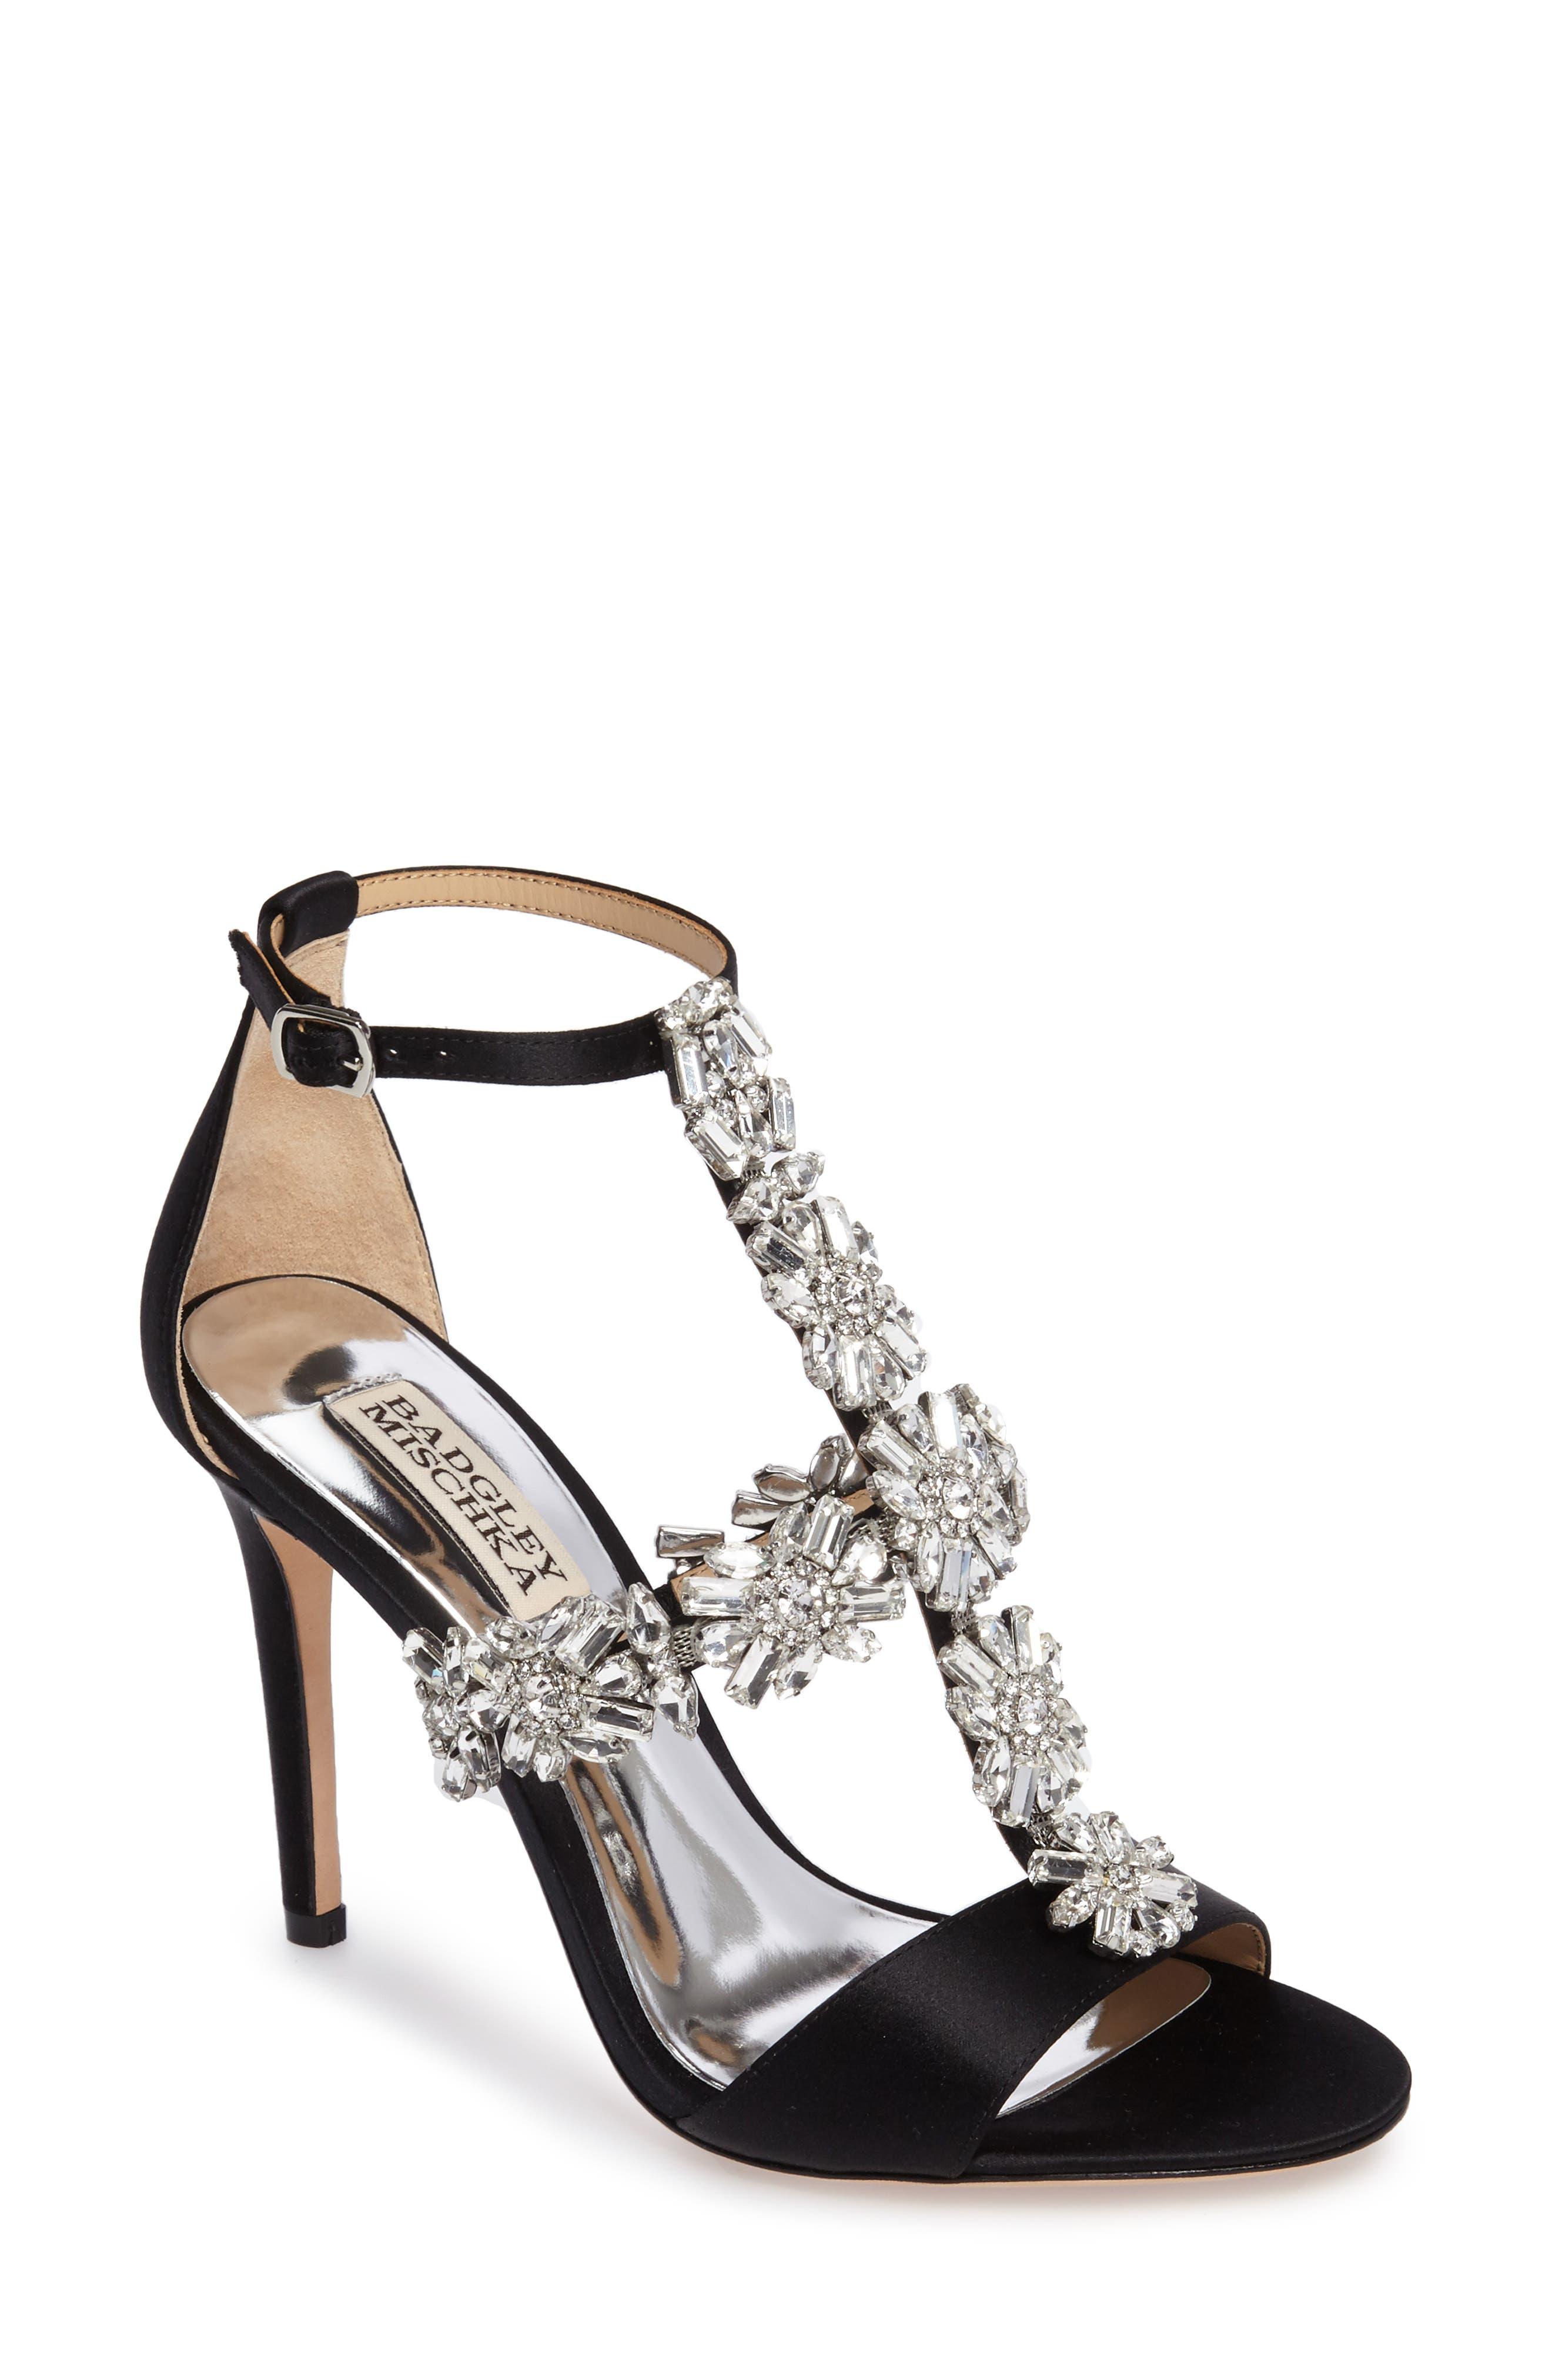 Main Image - Badgley Mischka Munroe Embellished Sandal (Women)